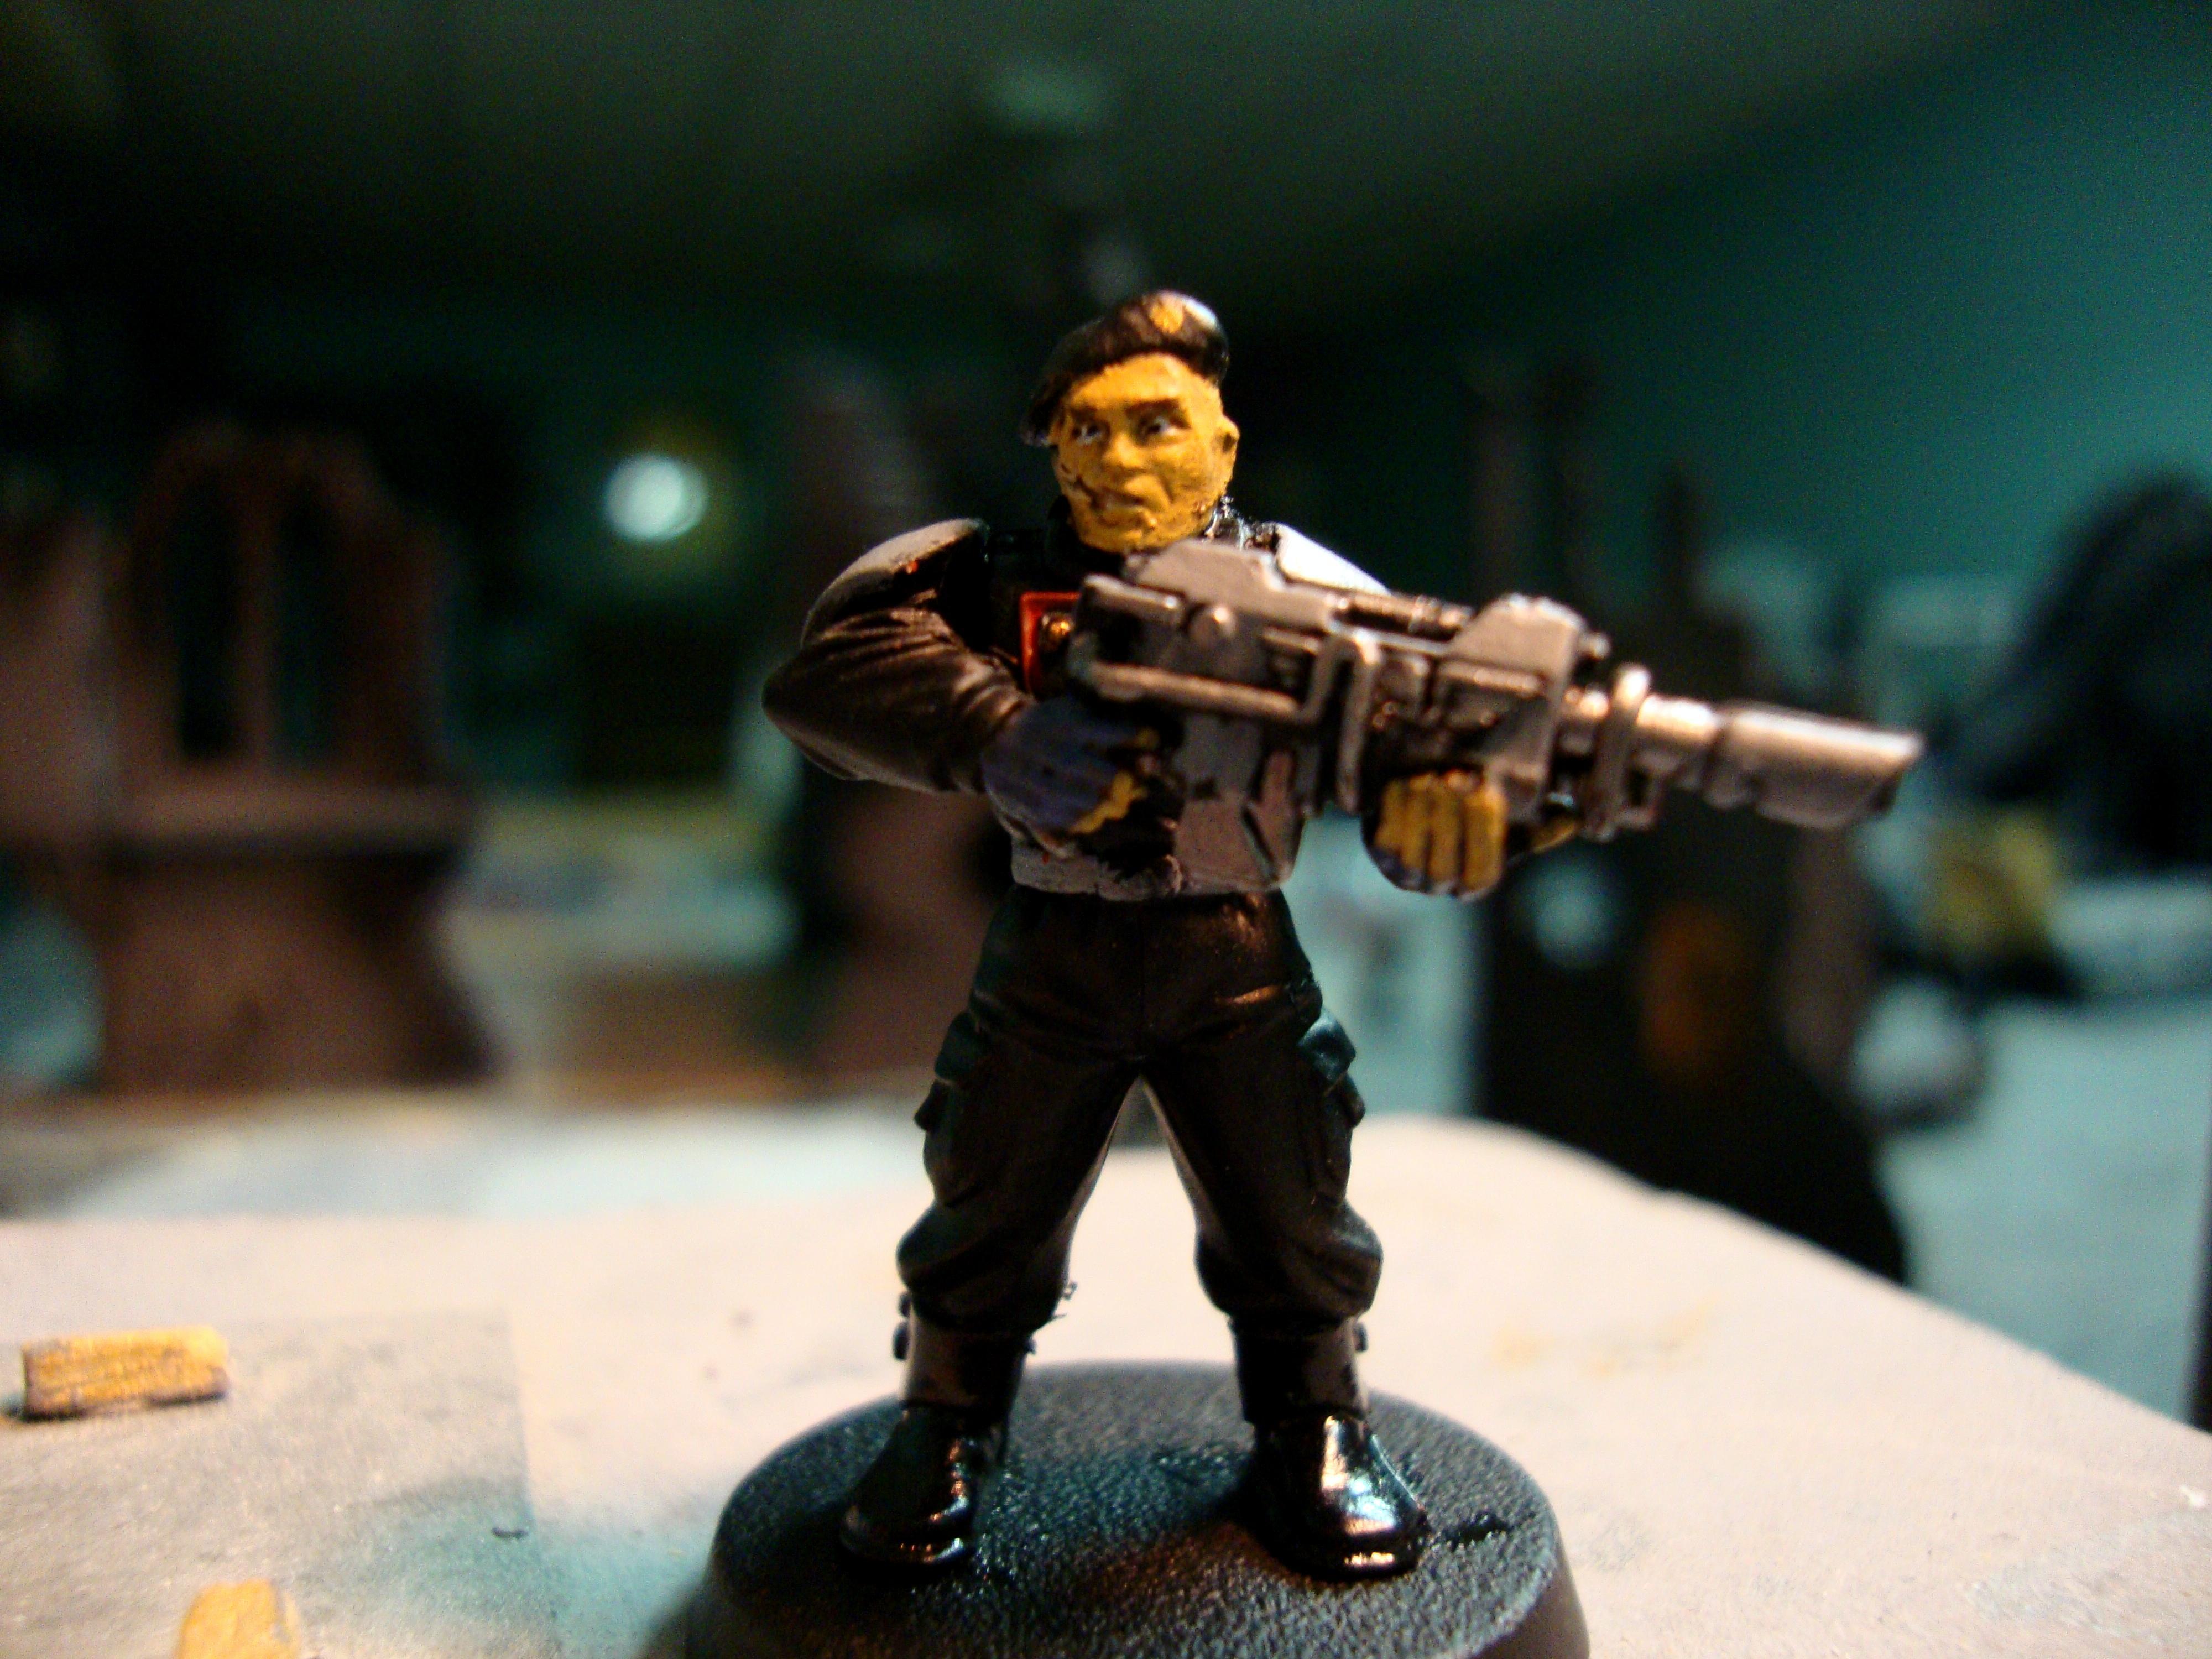 Imperial Guard, Tank Crewman, Warhammer 40,000